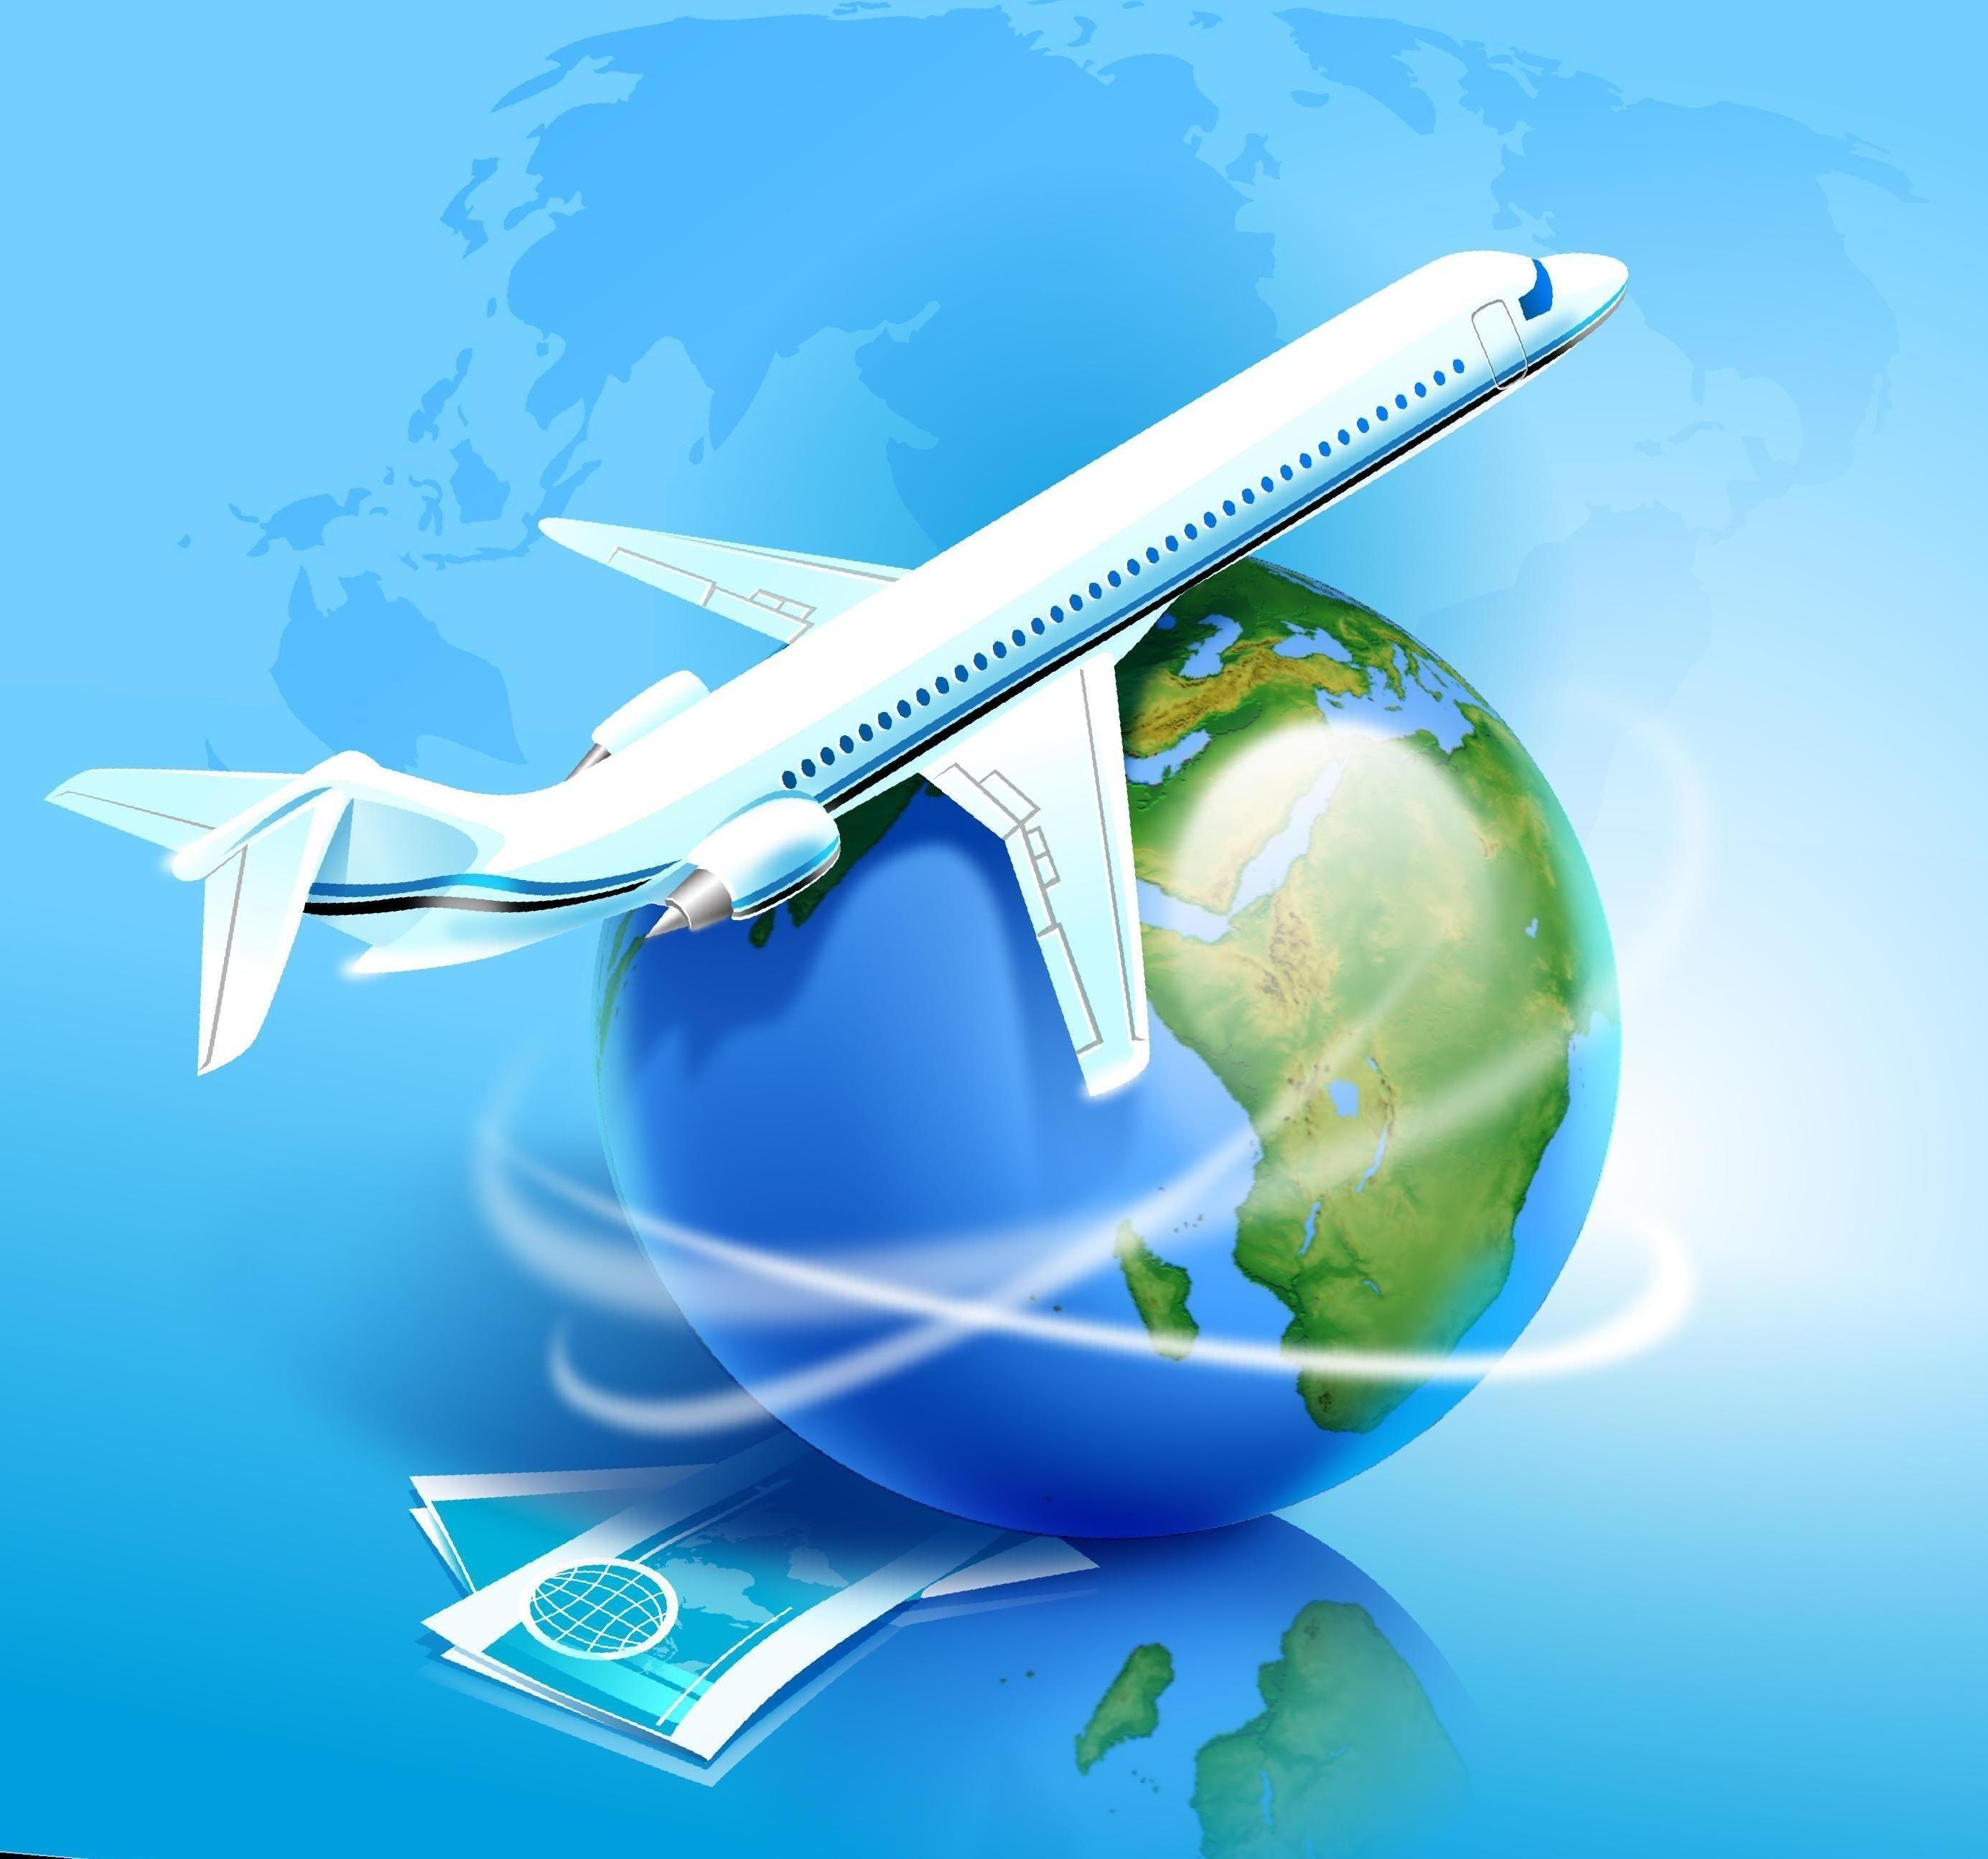 Изображение - Бизнес-план туристического агентства 92480089index.php